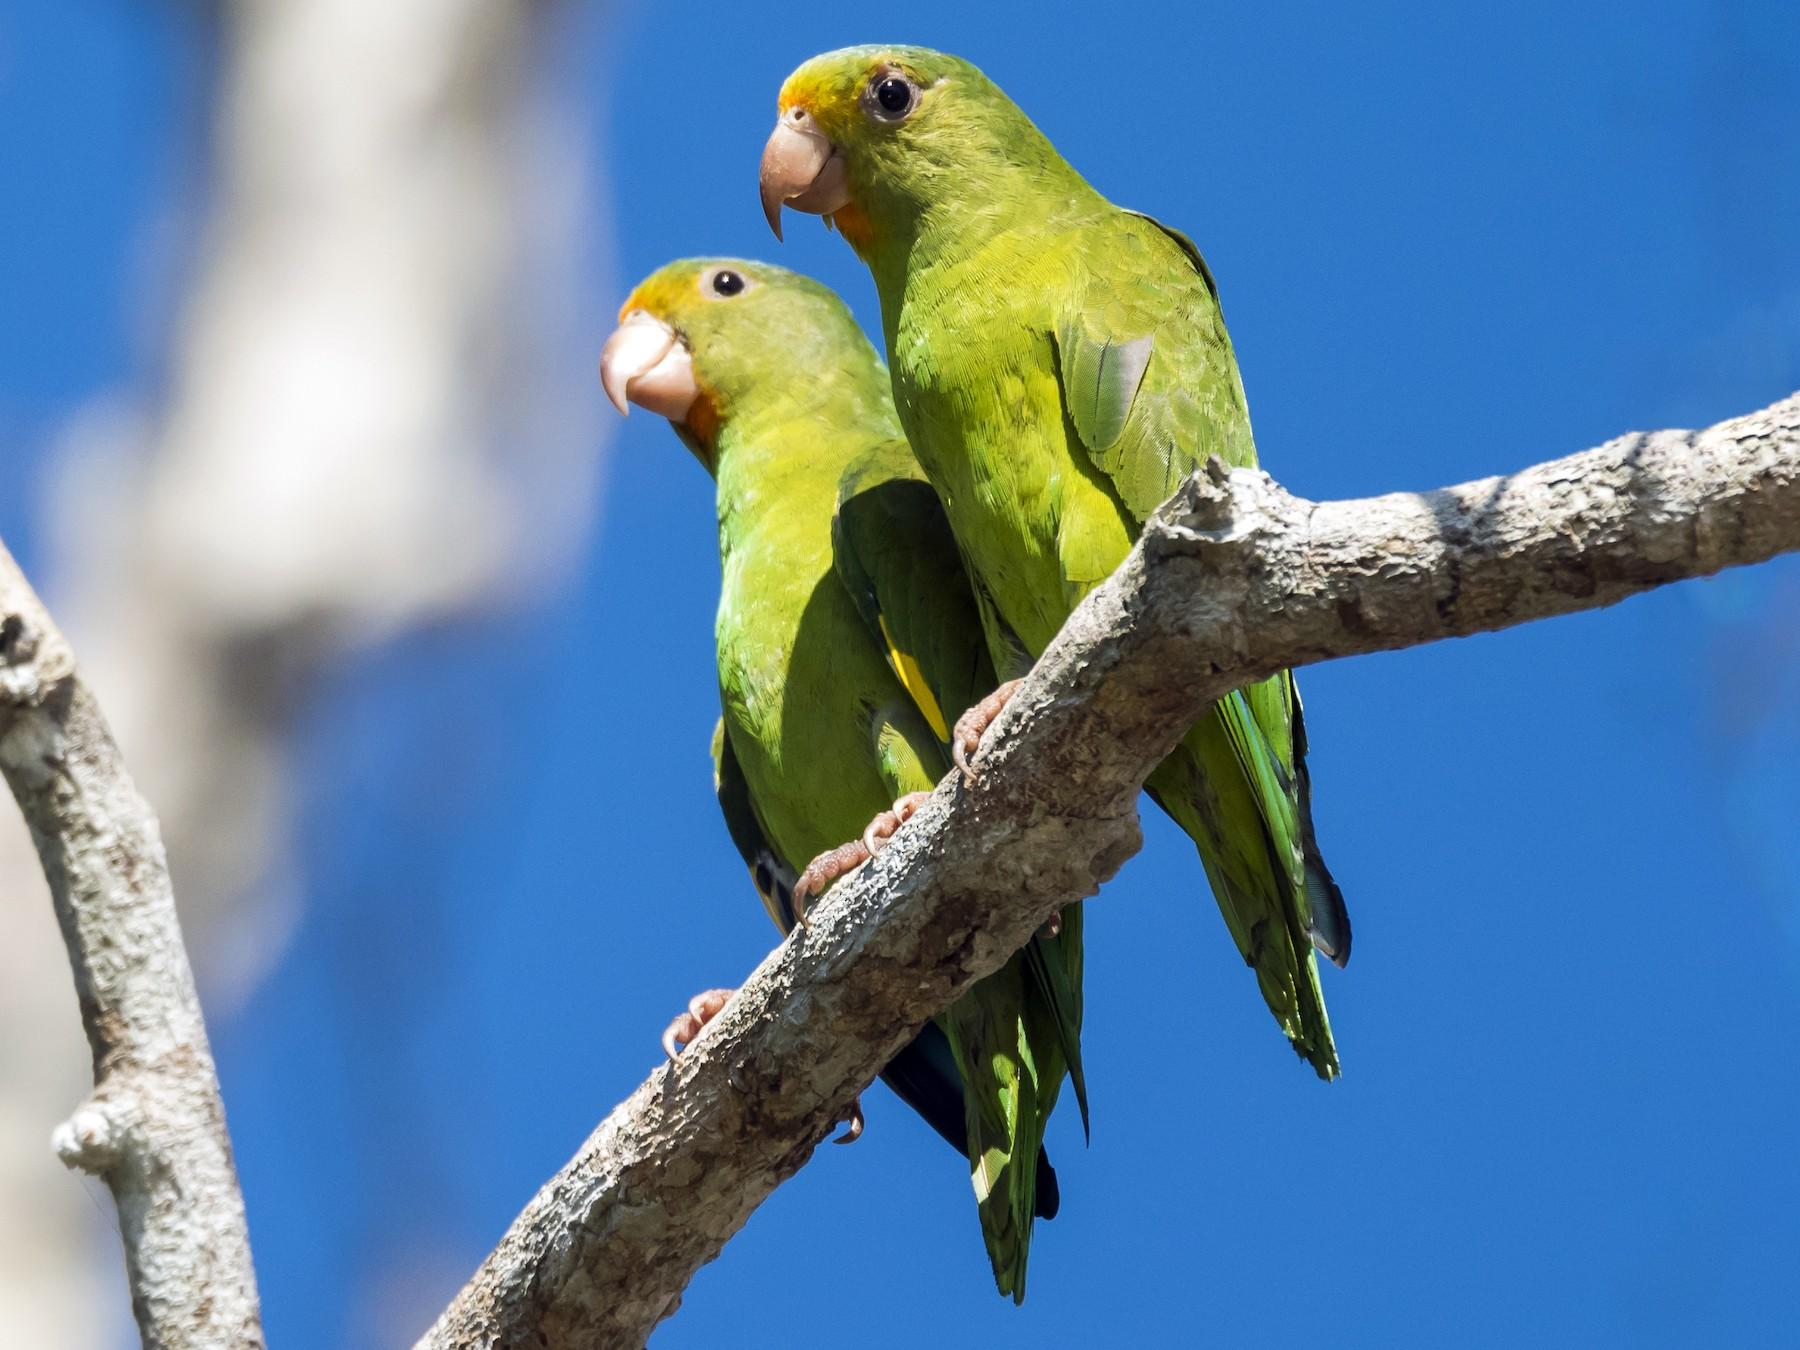 Golden-winged Parakeet - Claudia Brasileiro